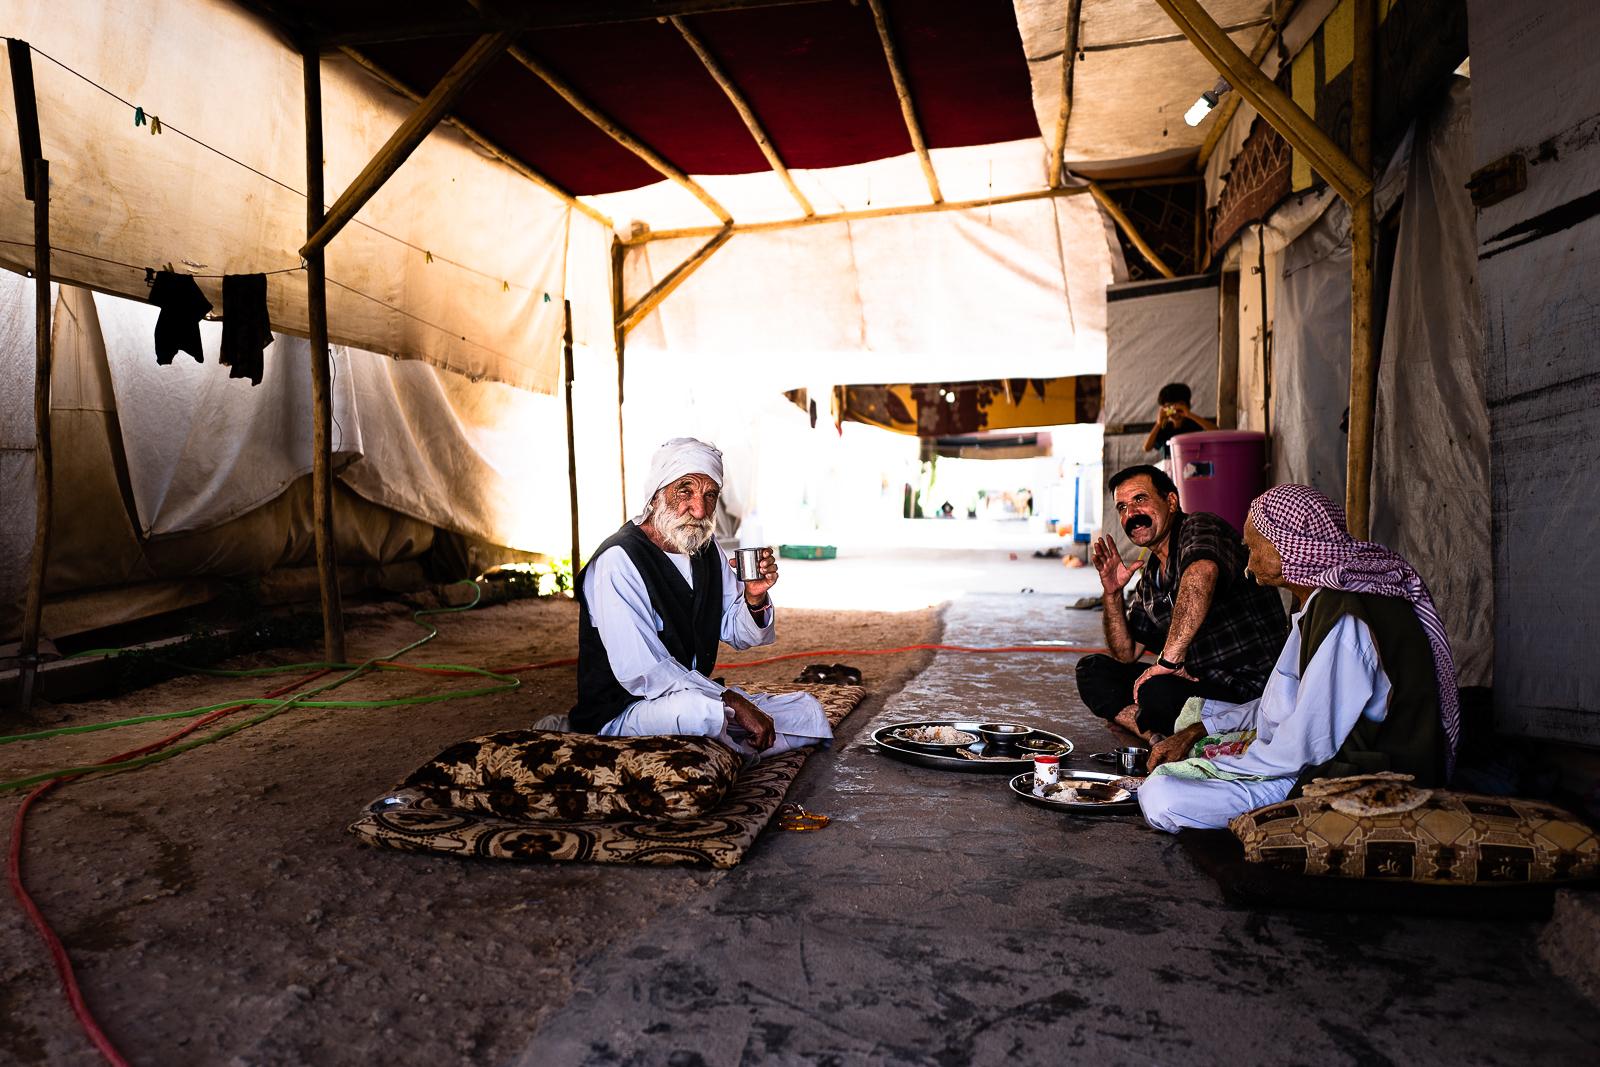 Scene of life in the refugees camp of Khanik, near Douhk